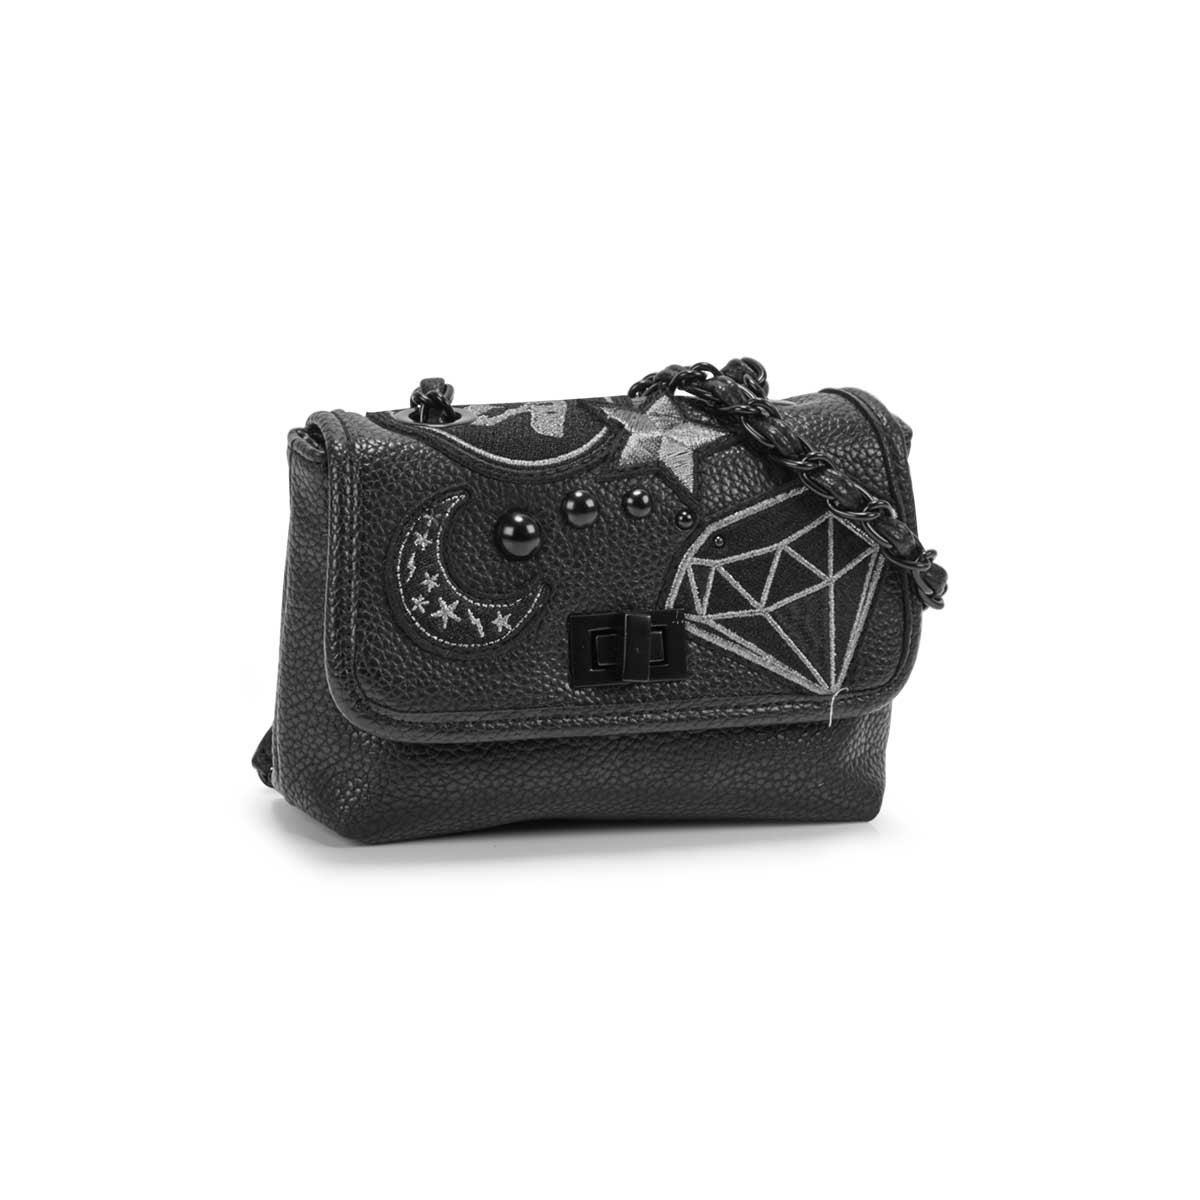 Lds BHayley black cross body bag